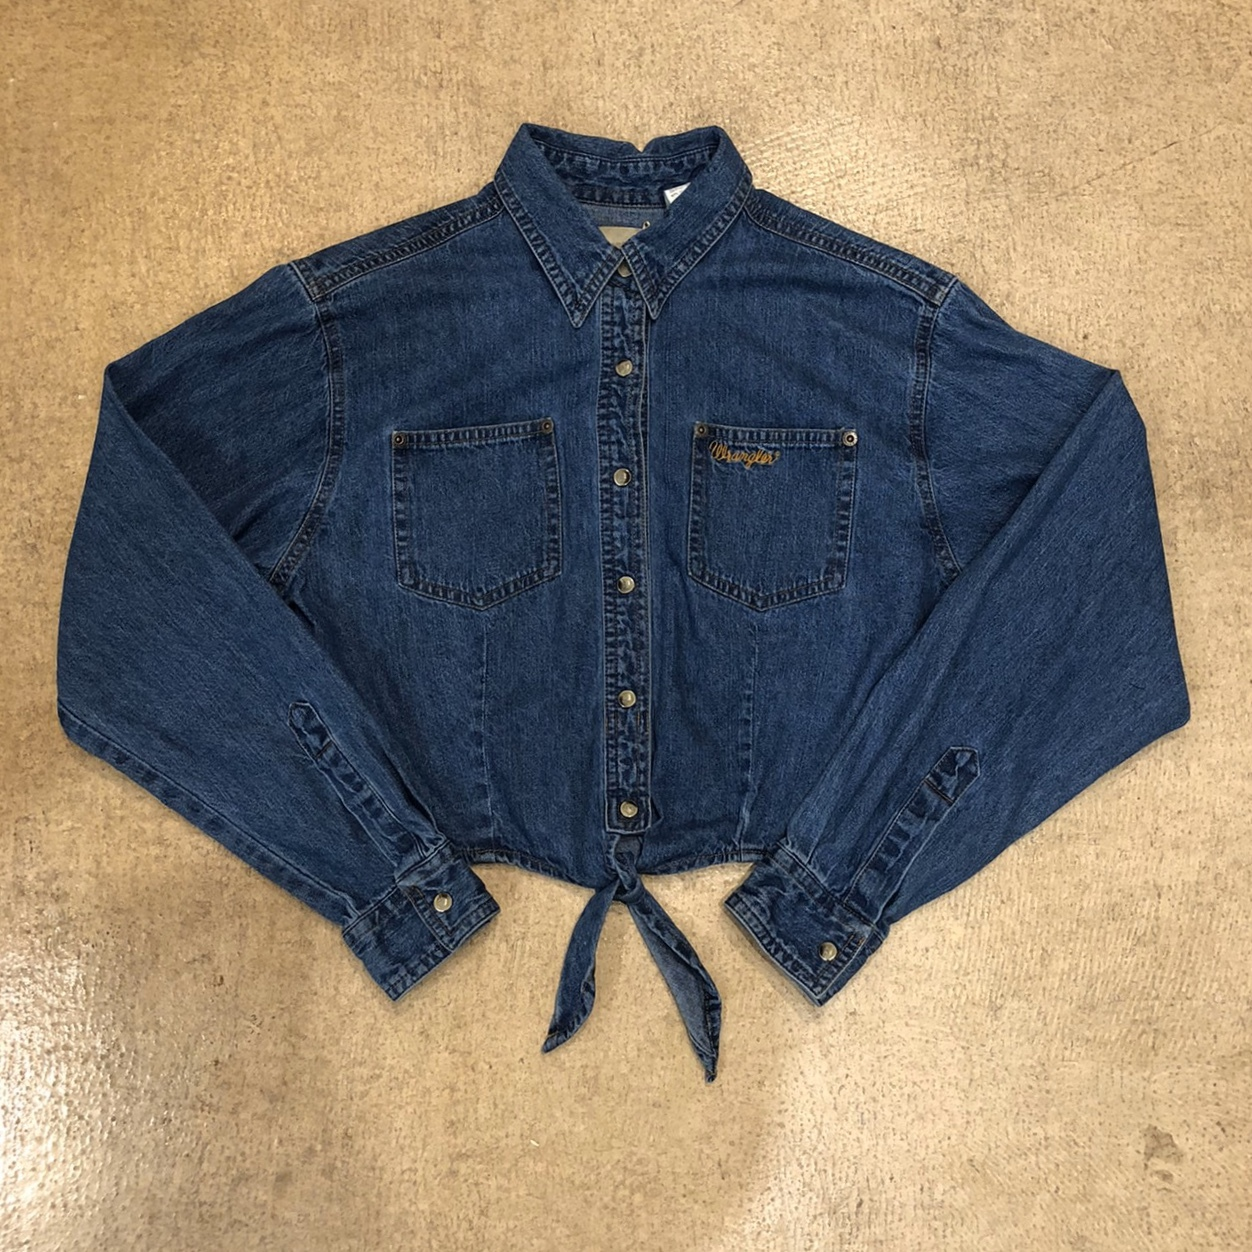 Wrangler Denim Shirts ¥6,400+tax